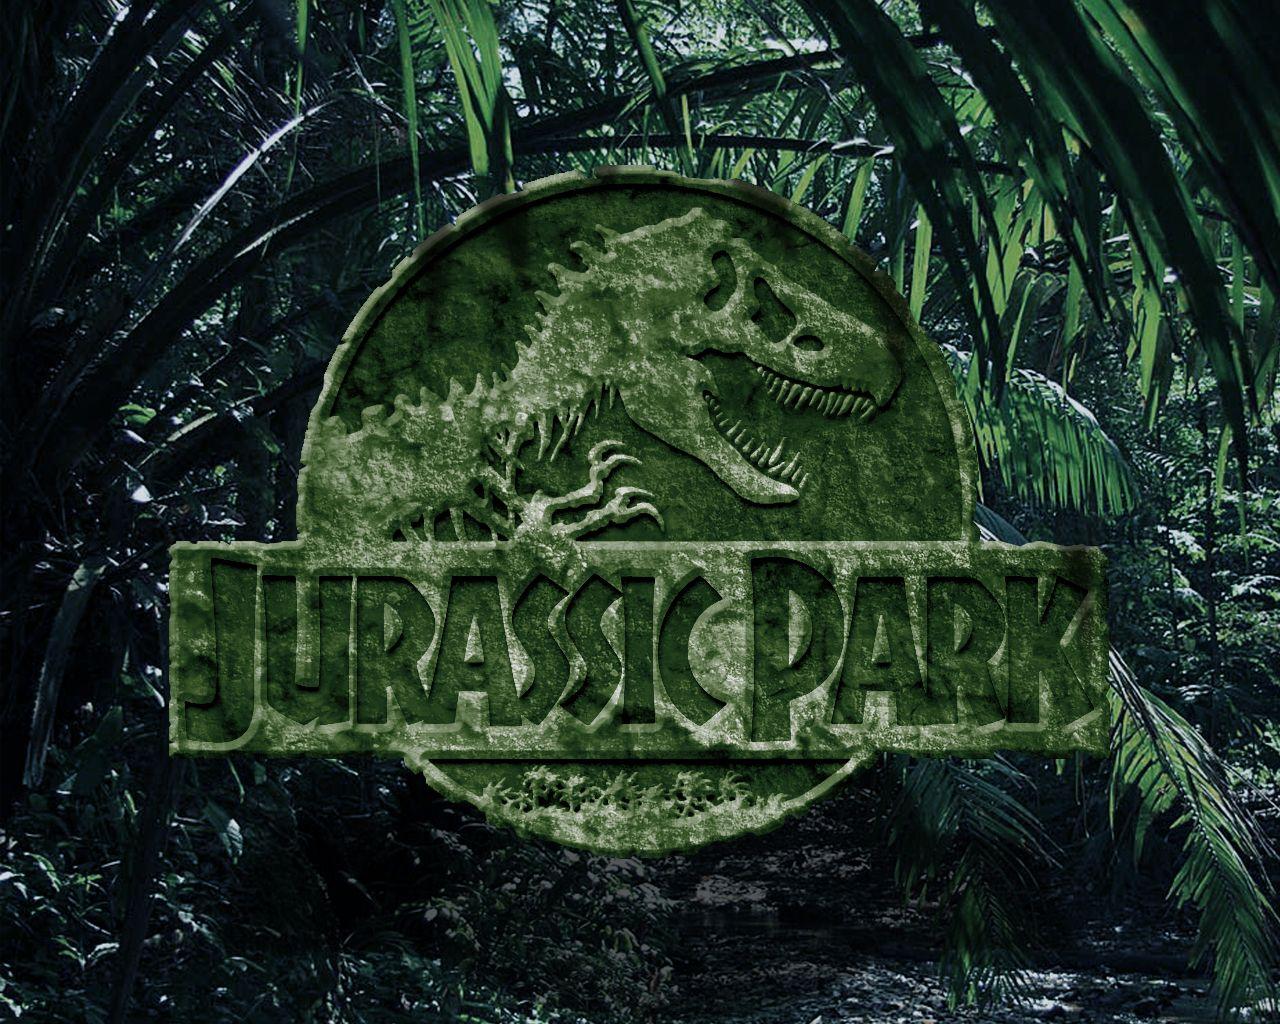 Jurassic park card 3 by chicagocubsfan24 on deviantart - Jurassic Park